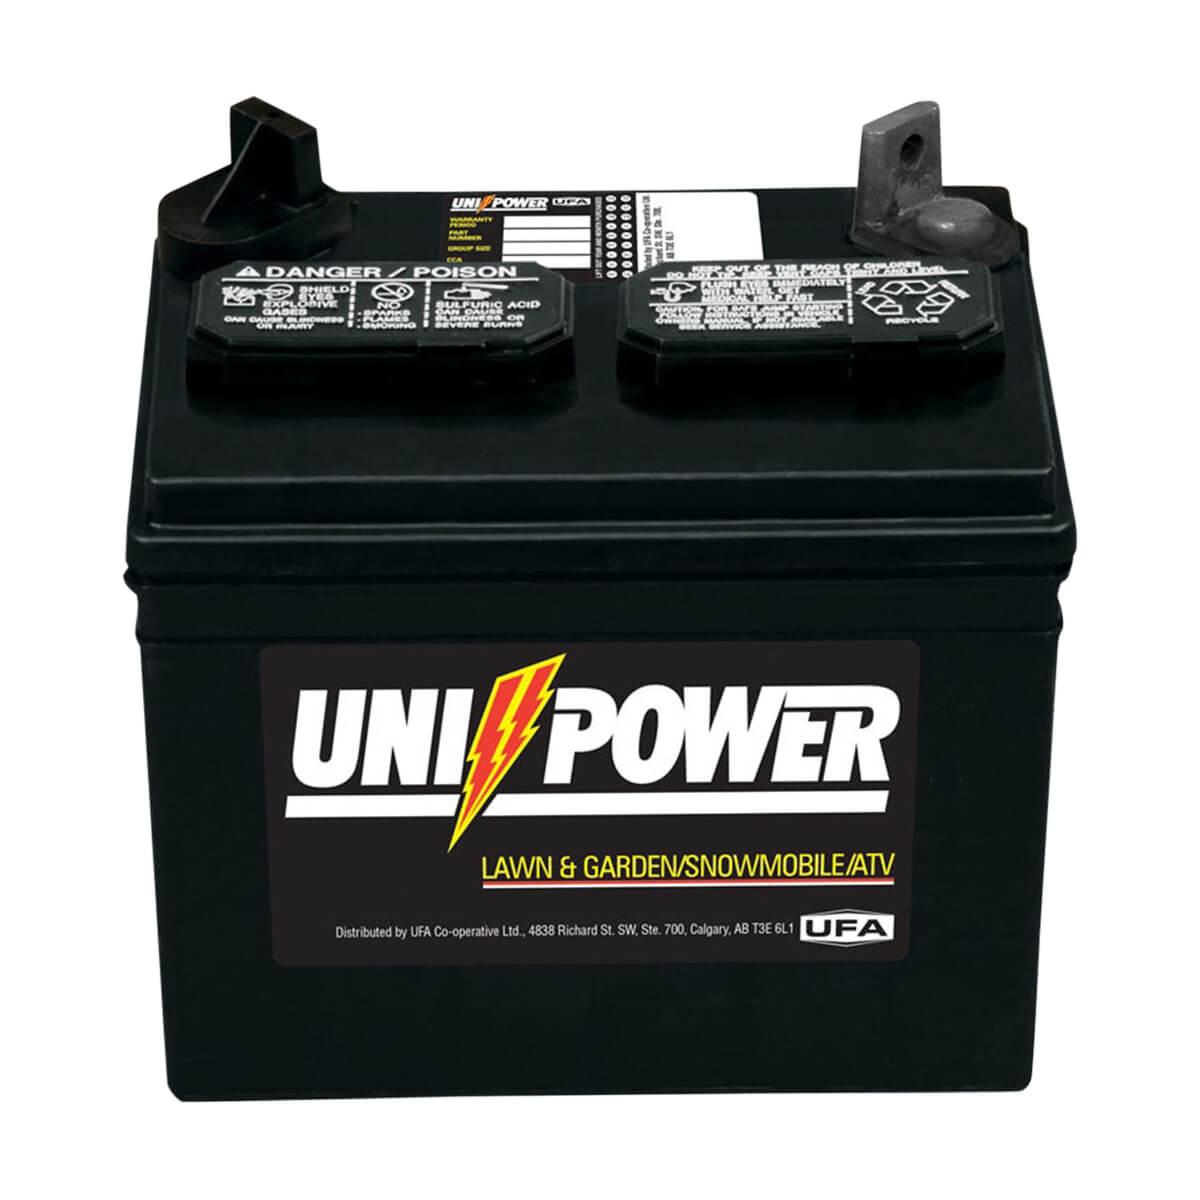 Uni-Power Heavy Duty Lawn and Garden 12 Volt Battery - 8-U-1XP